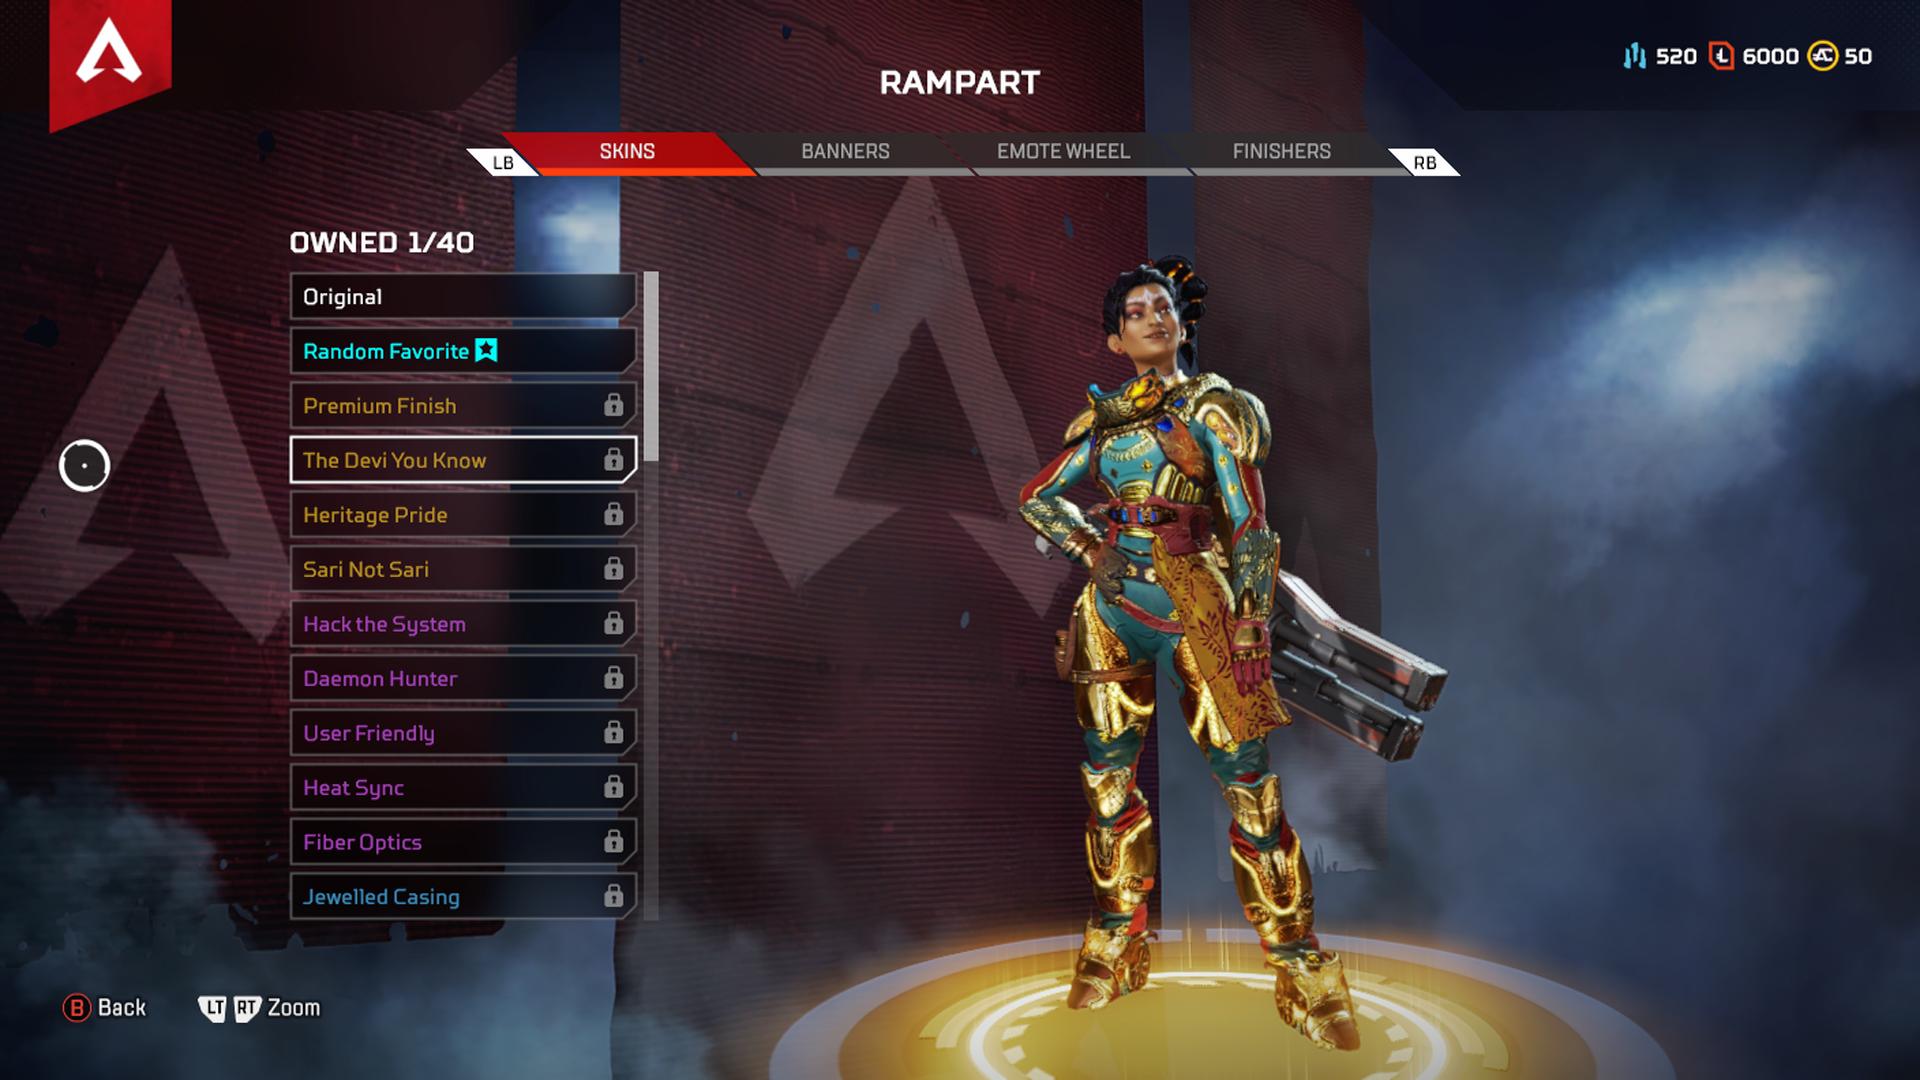 apex legends rampart legendary skins